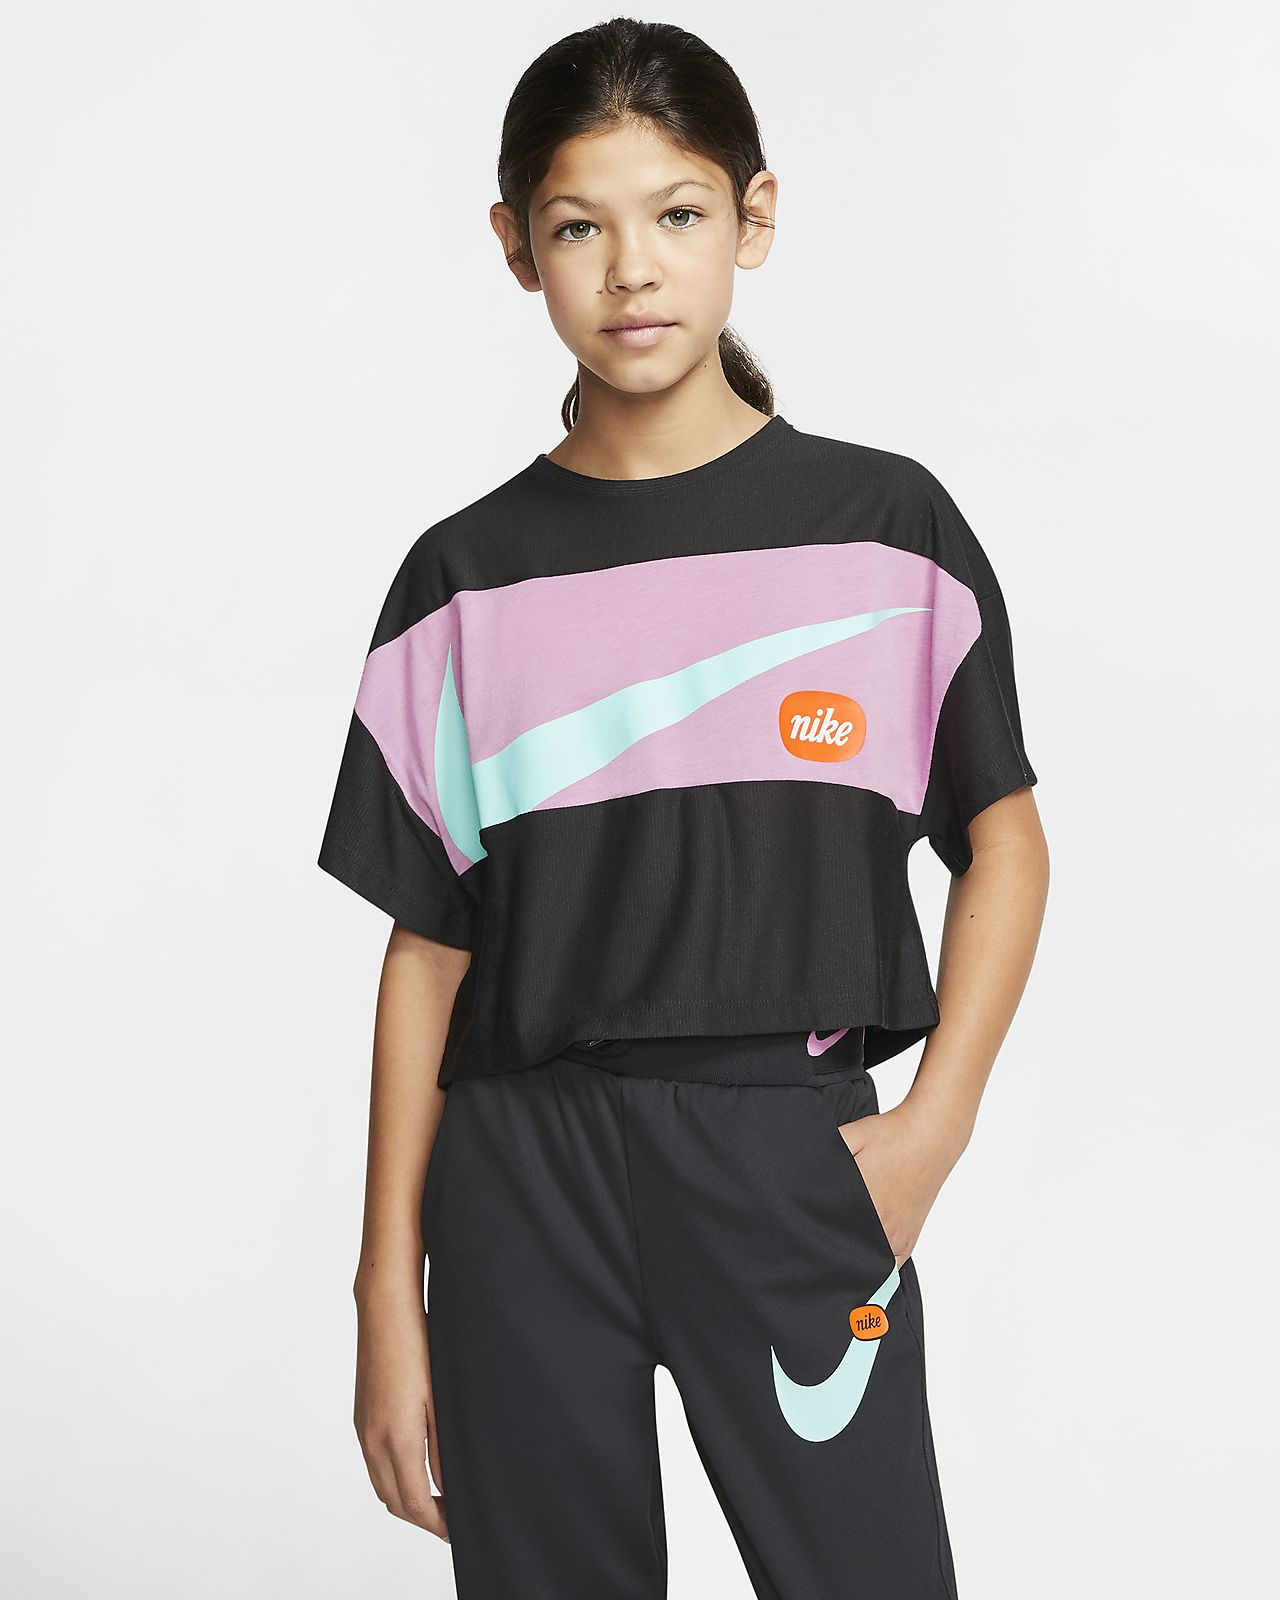 Nike Trainingstop met korte mouwen voor meisjes